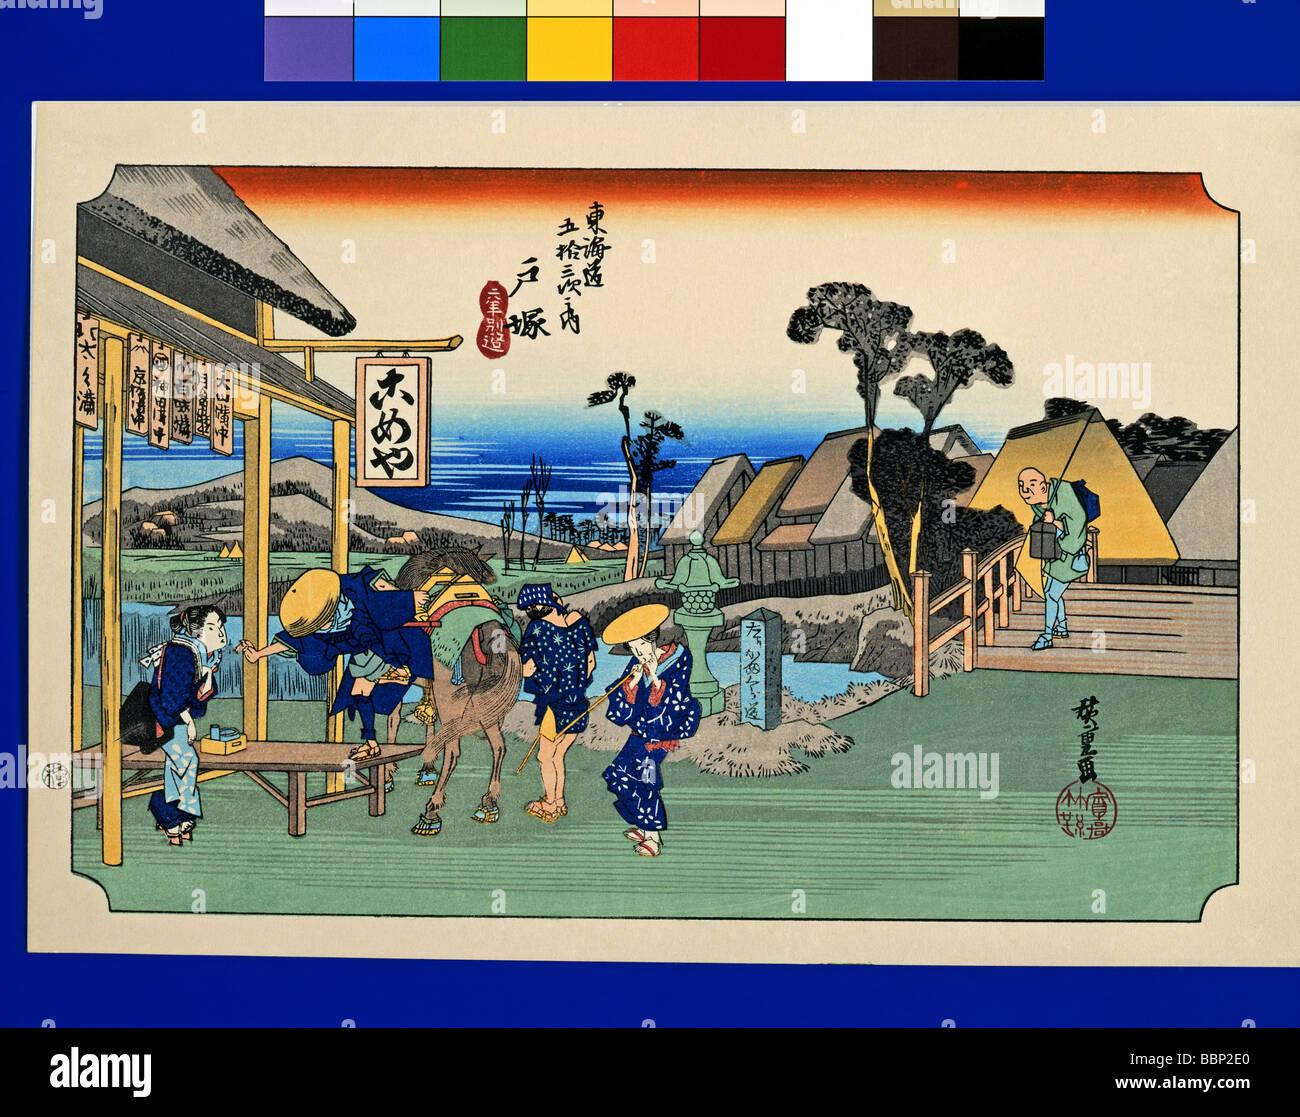 Utagawa Hiroshige, The Fifty-three Stations of the Tokaido, Totsuka, - Stock Image